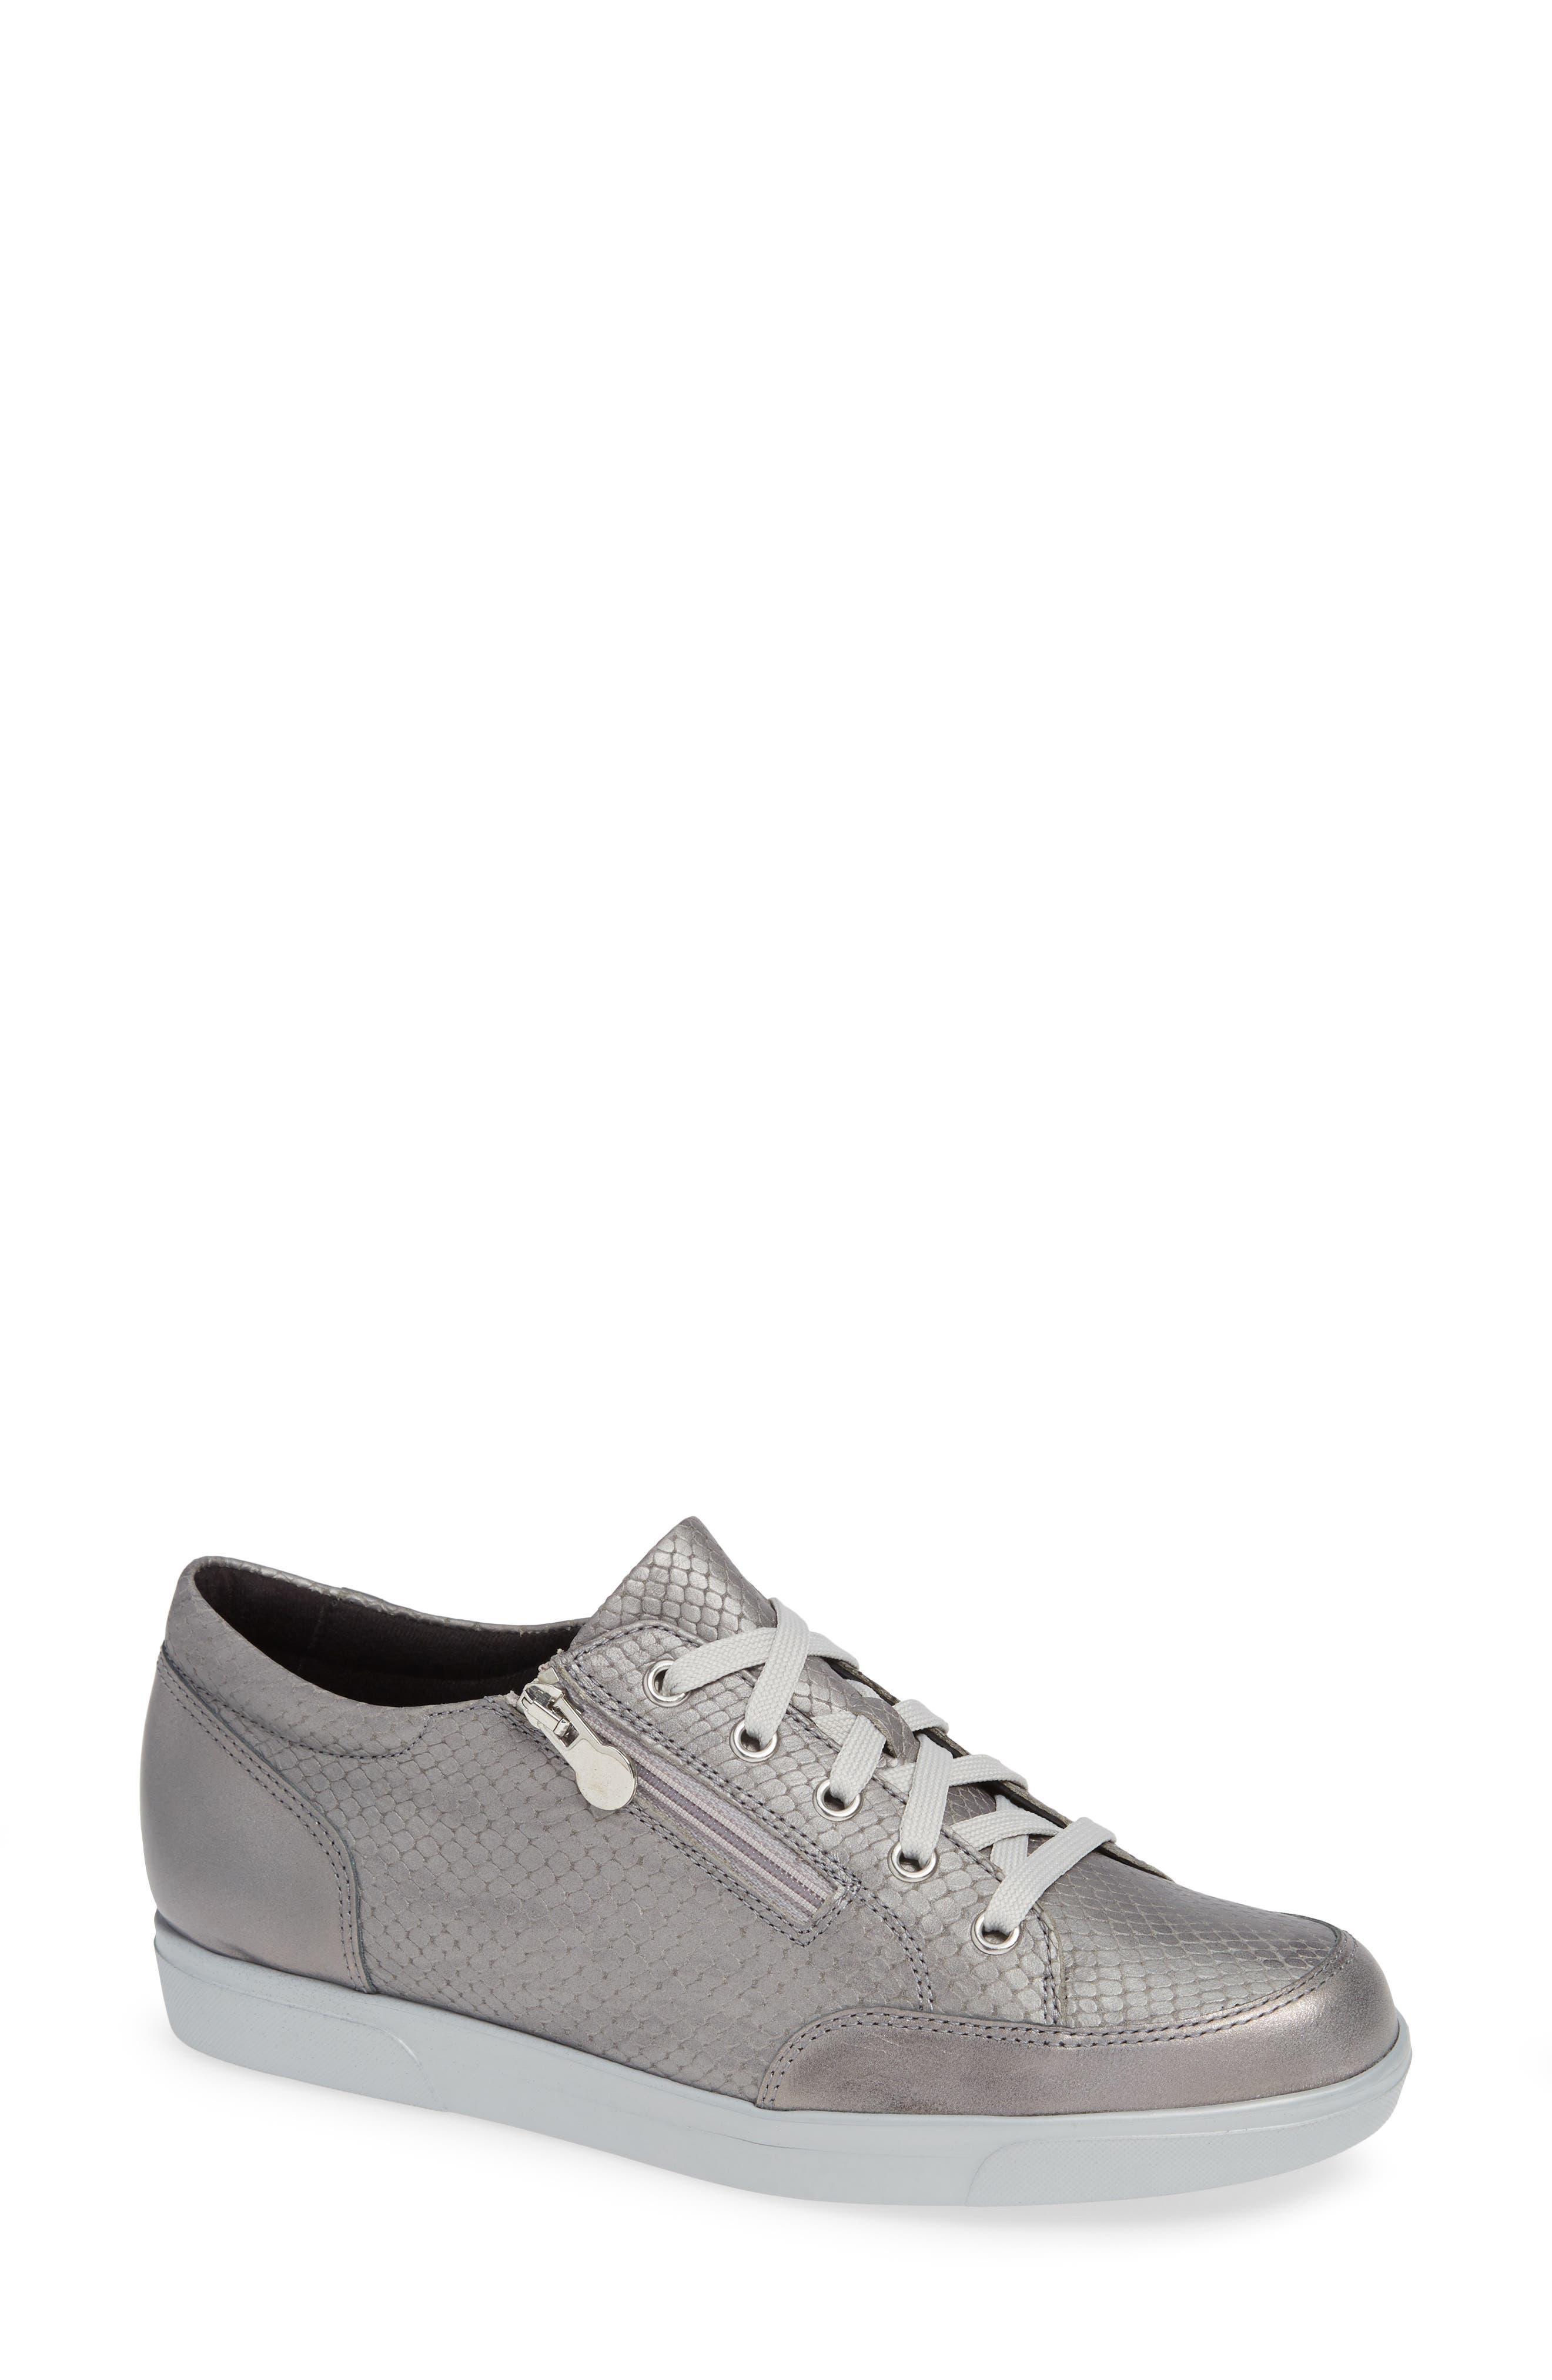 Gabbie Sneaker,                         Main,                         color, LIGHT GREY LEATHER